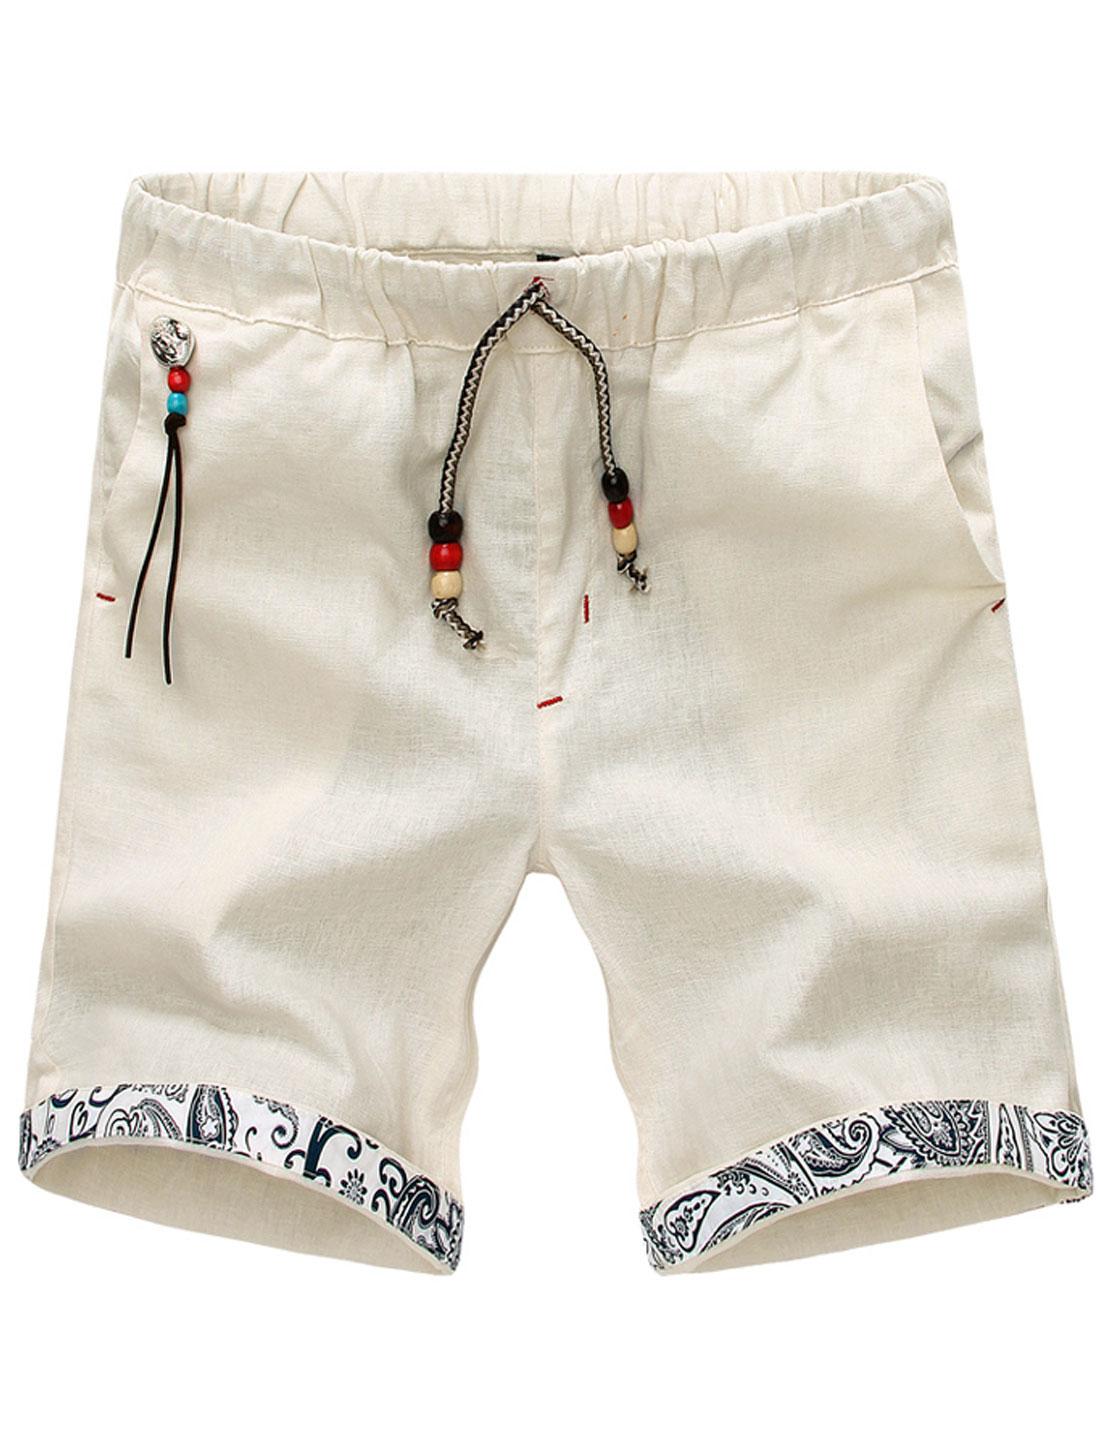 Men Stretchy Waist Wooden Pearls Decor Casual Short Pants Beige W32